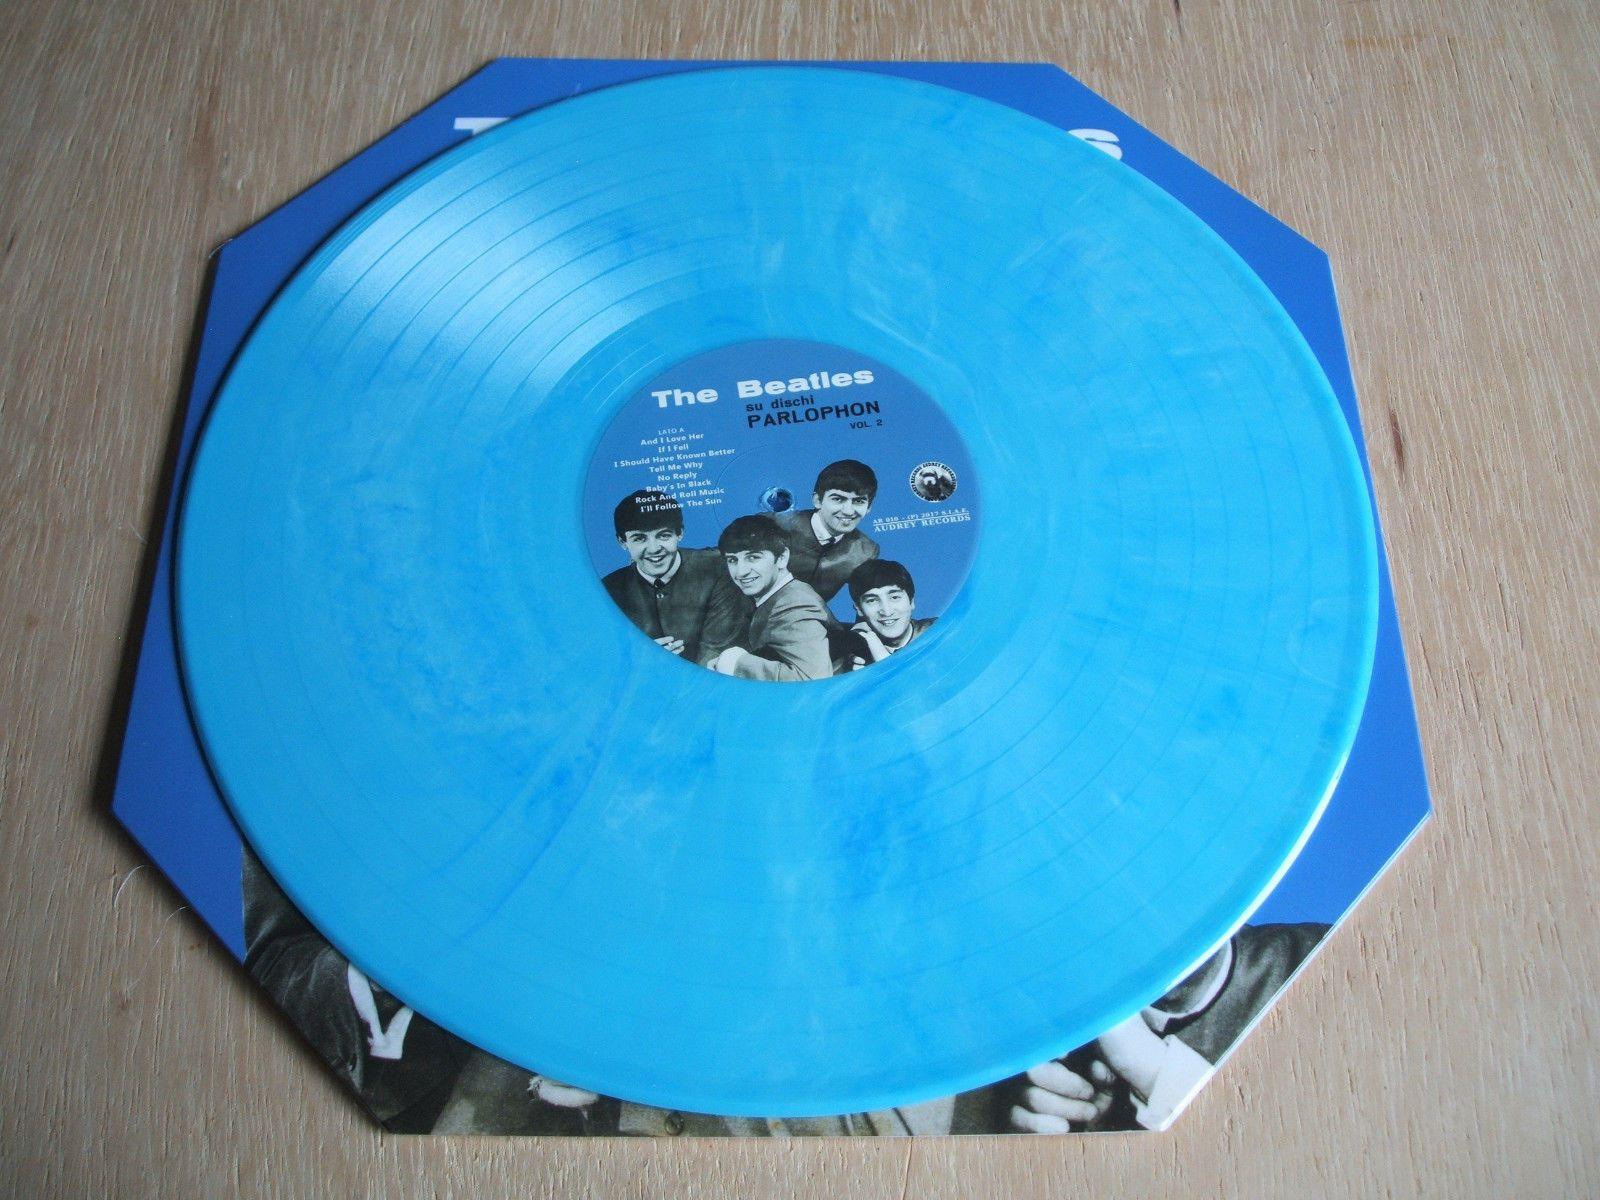 The Beatles Su Dischi Parlophon Vol 2 Blue Vinyl Lp Octagon Sleeve Blue Vinyl Vinyl Vinyl Records